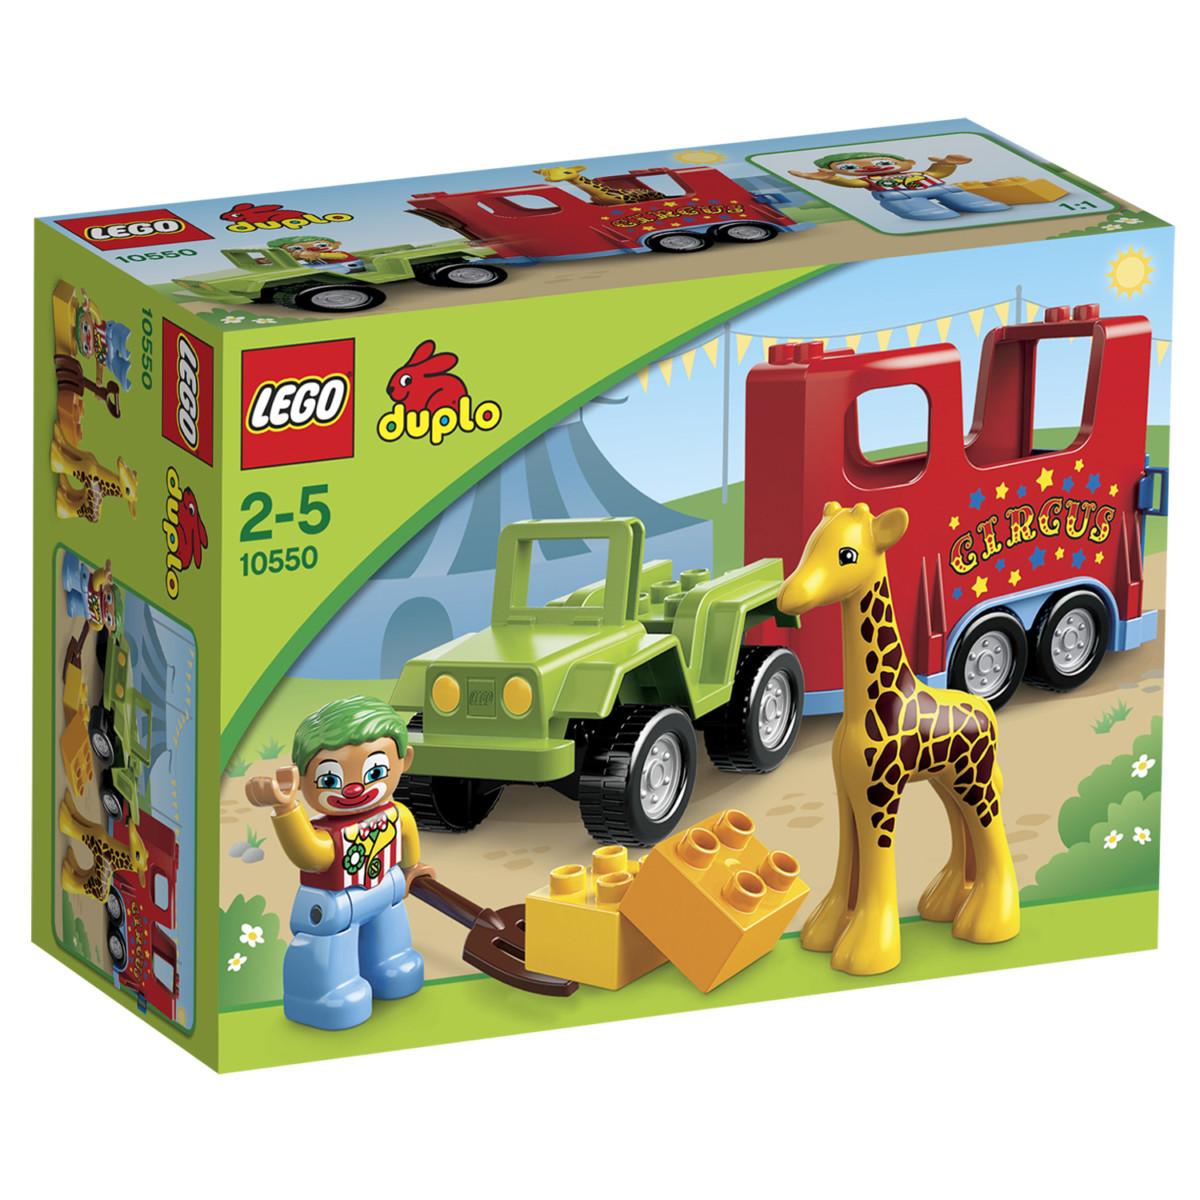 Lego 10550 Duplo : Le transport du cirque